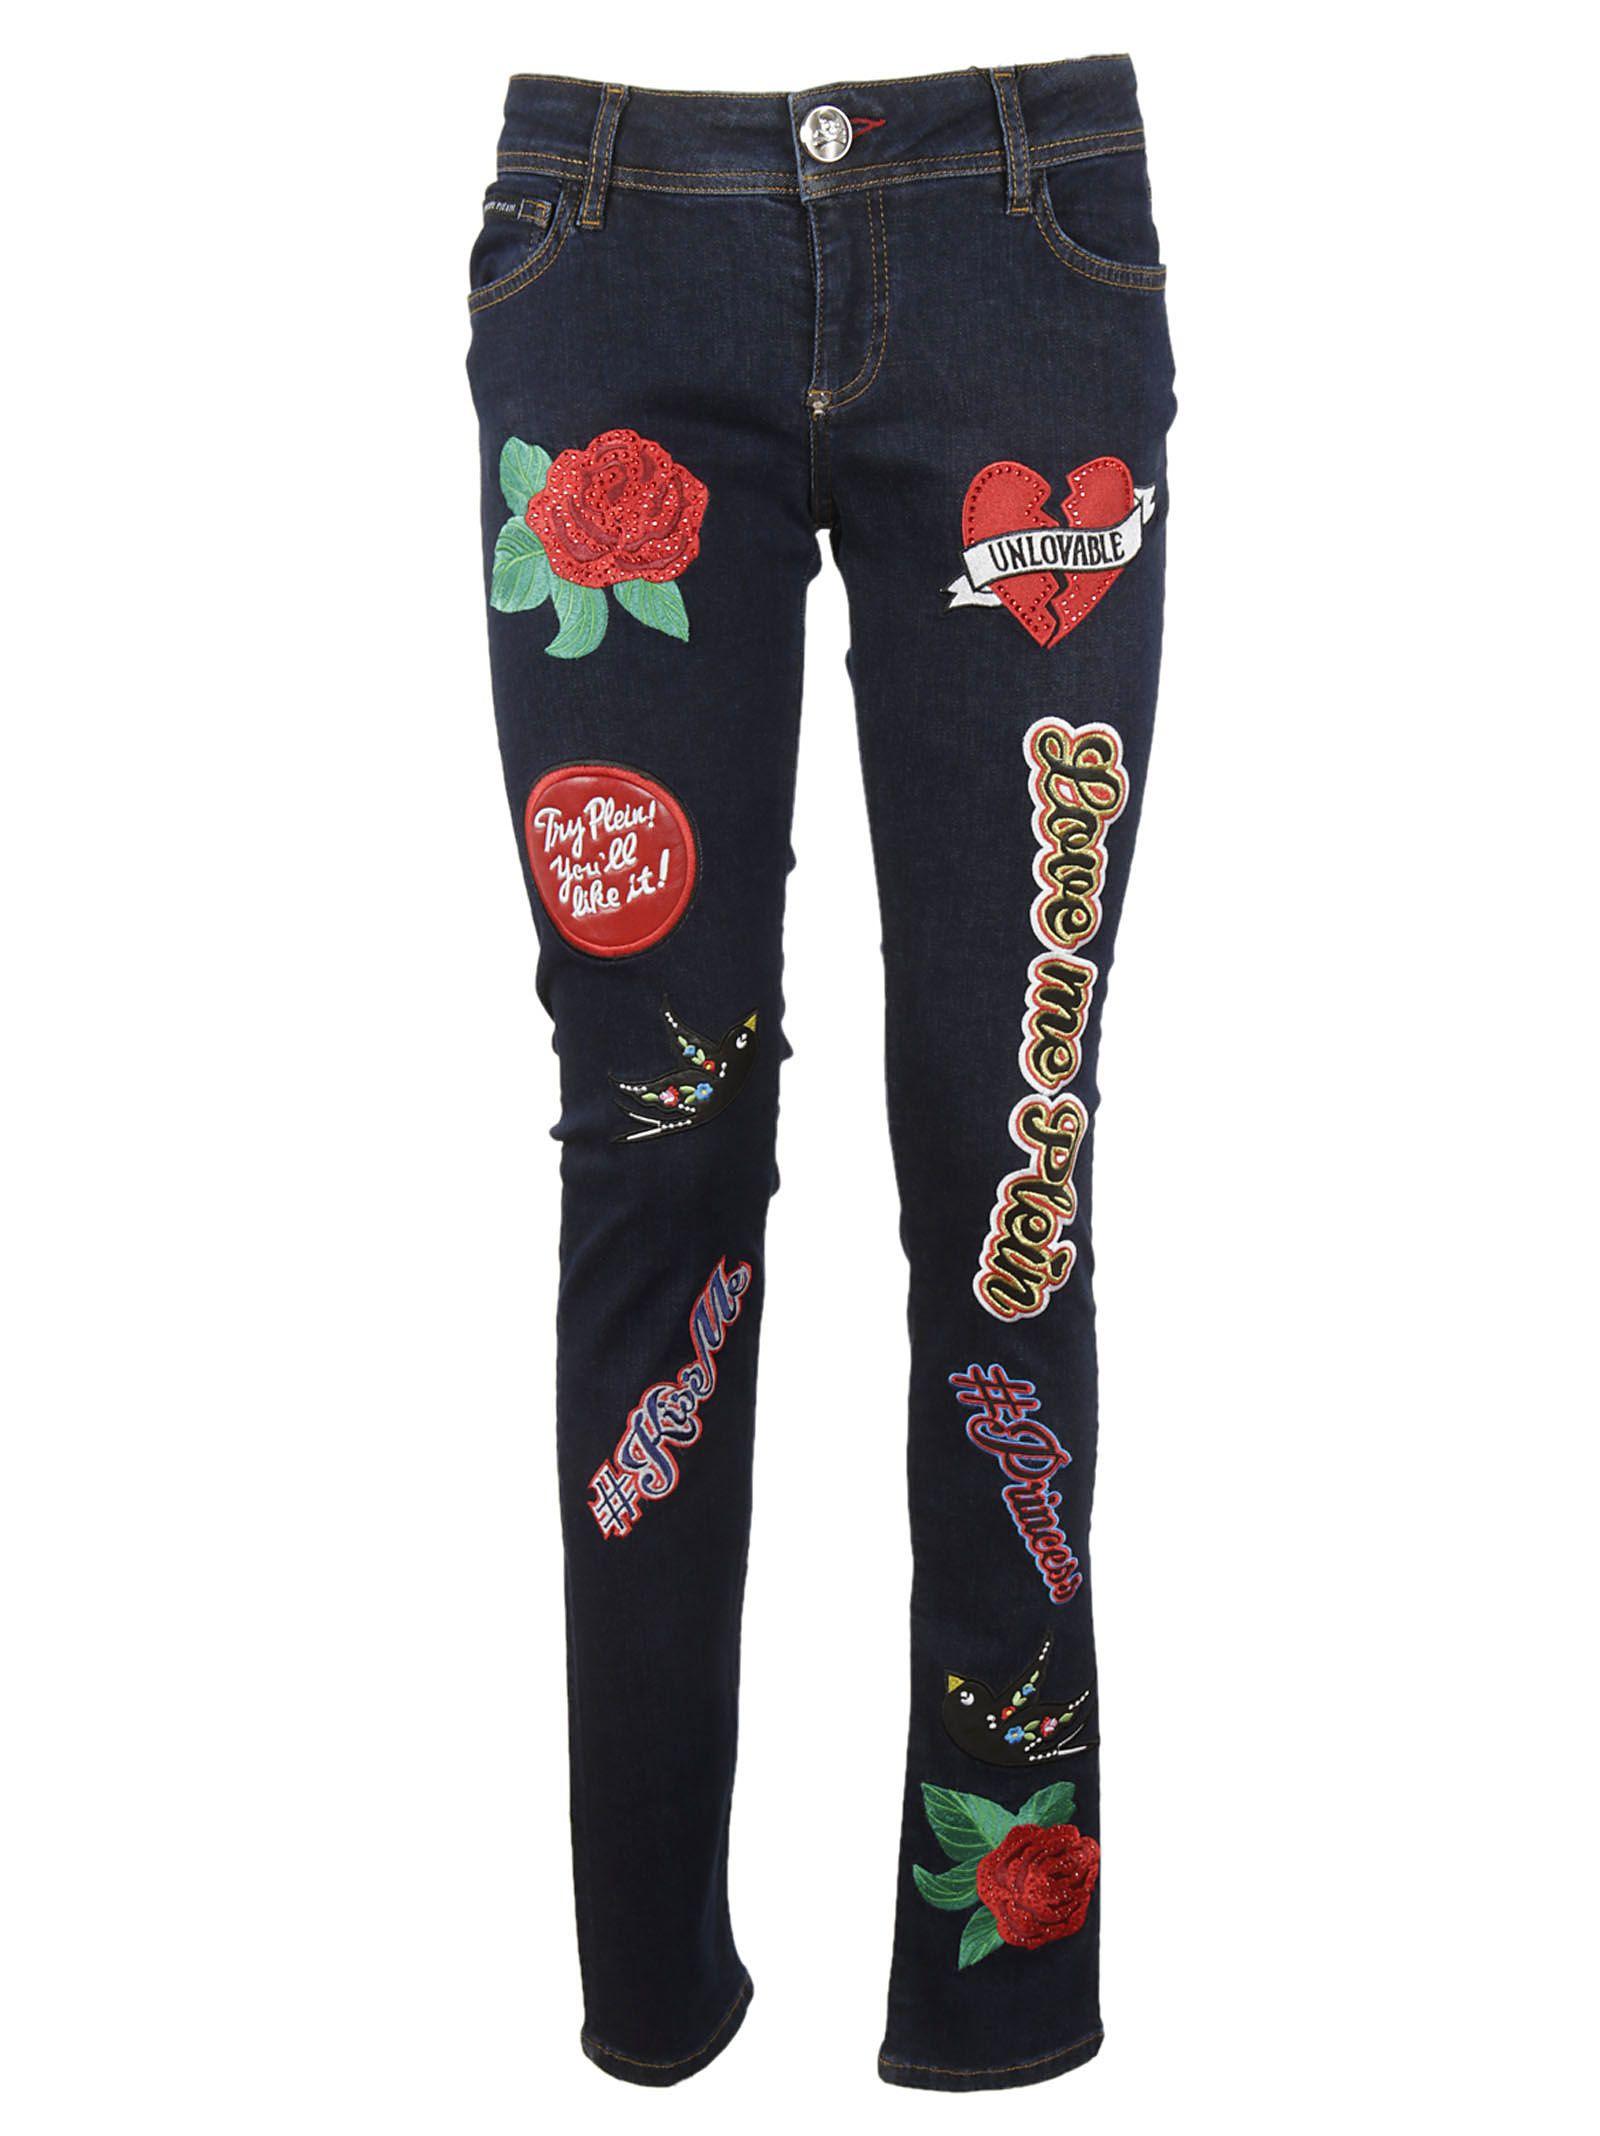 Philipp Plein Slim Fit Jeans